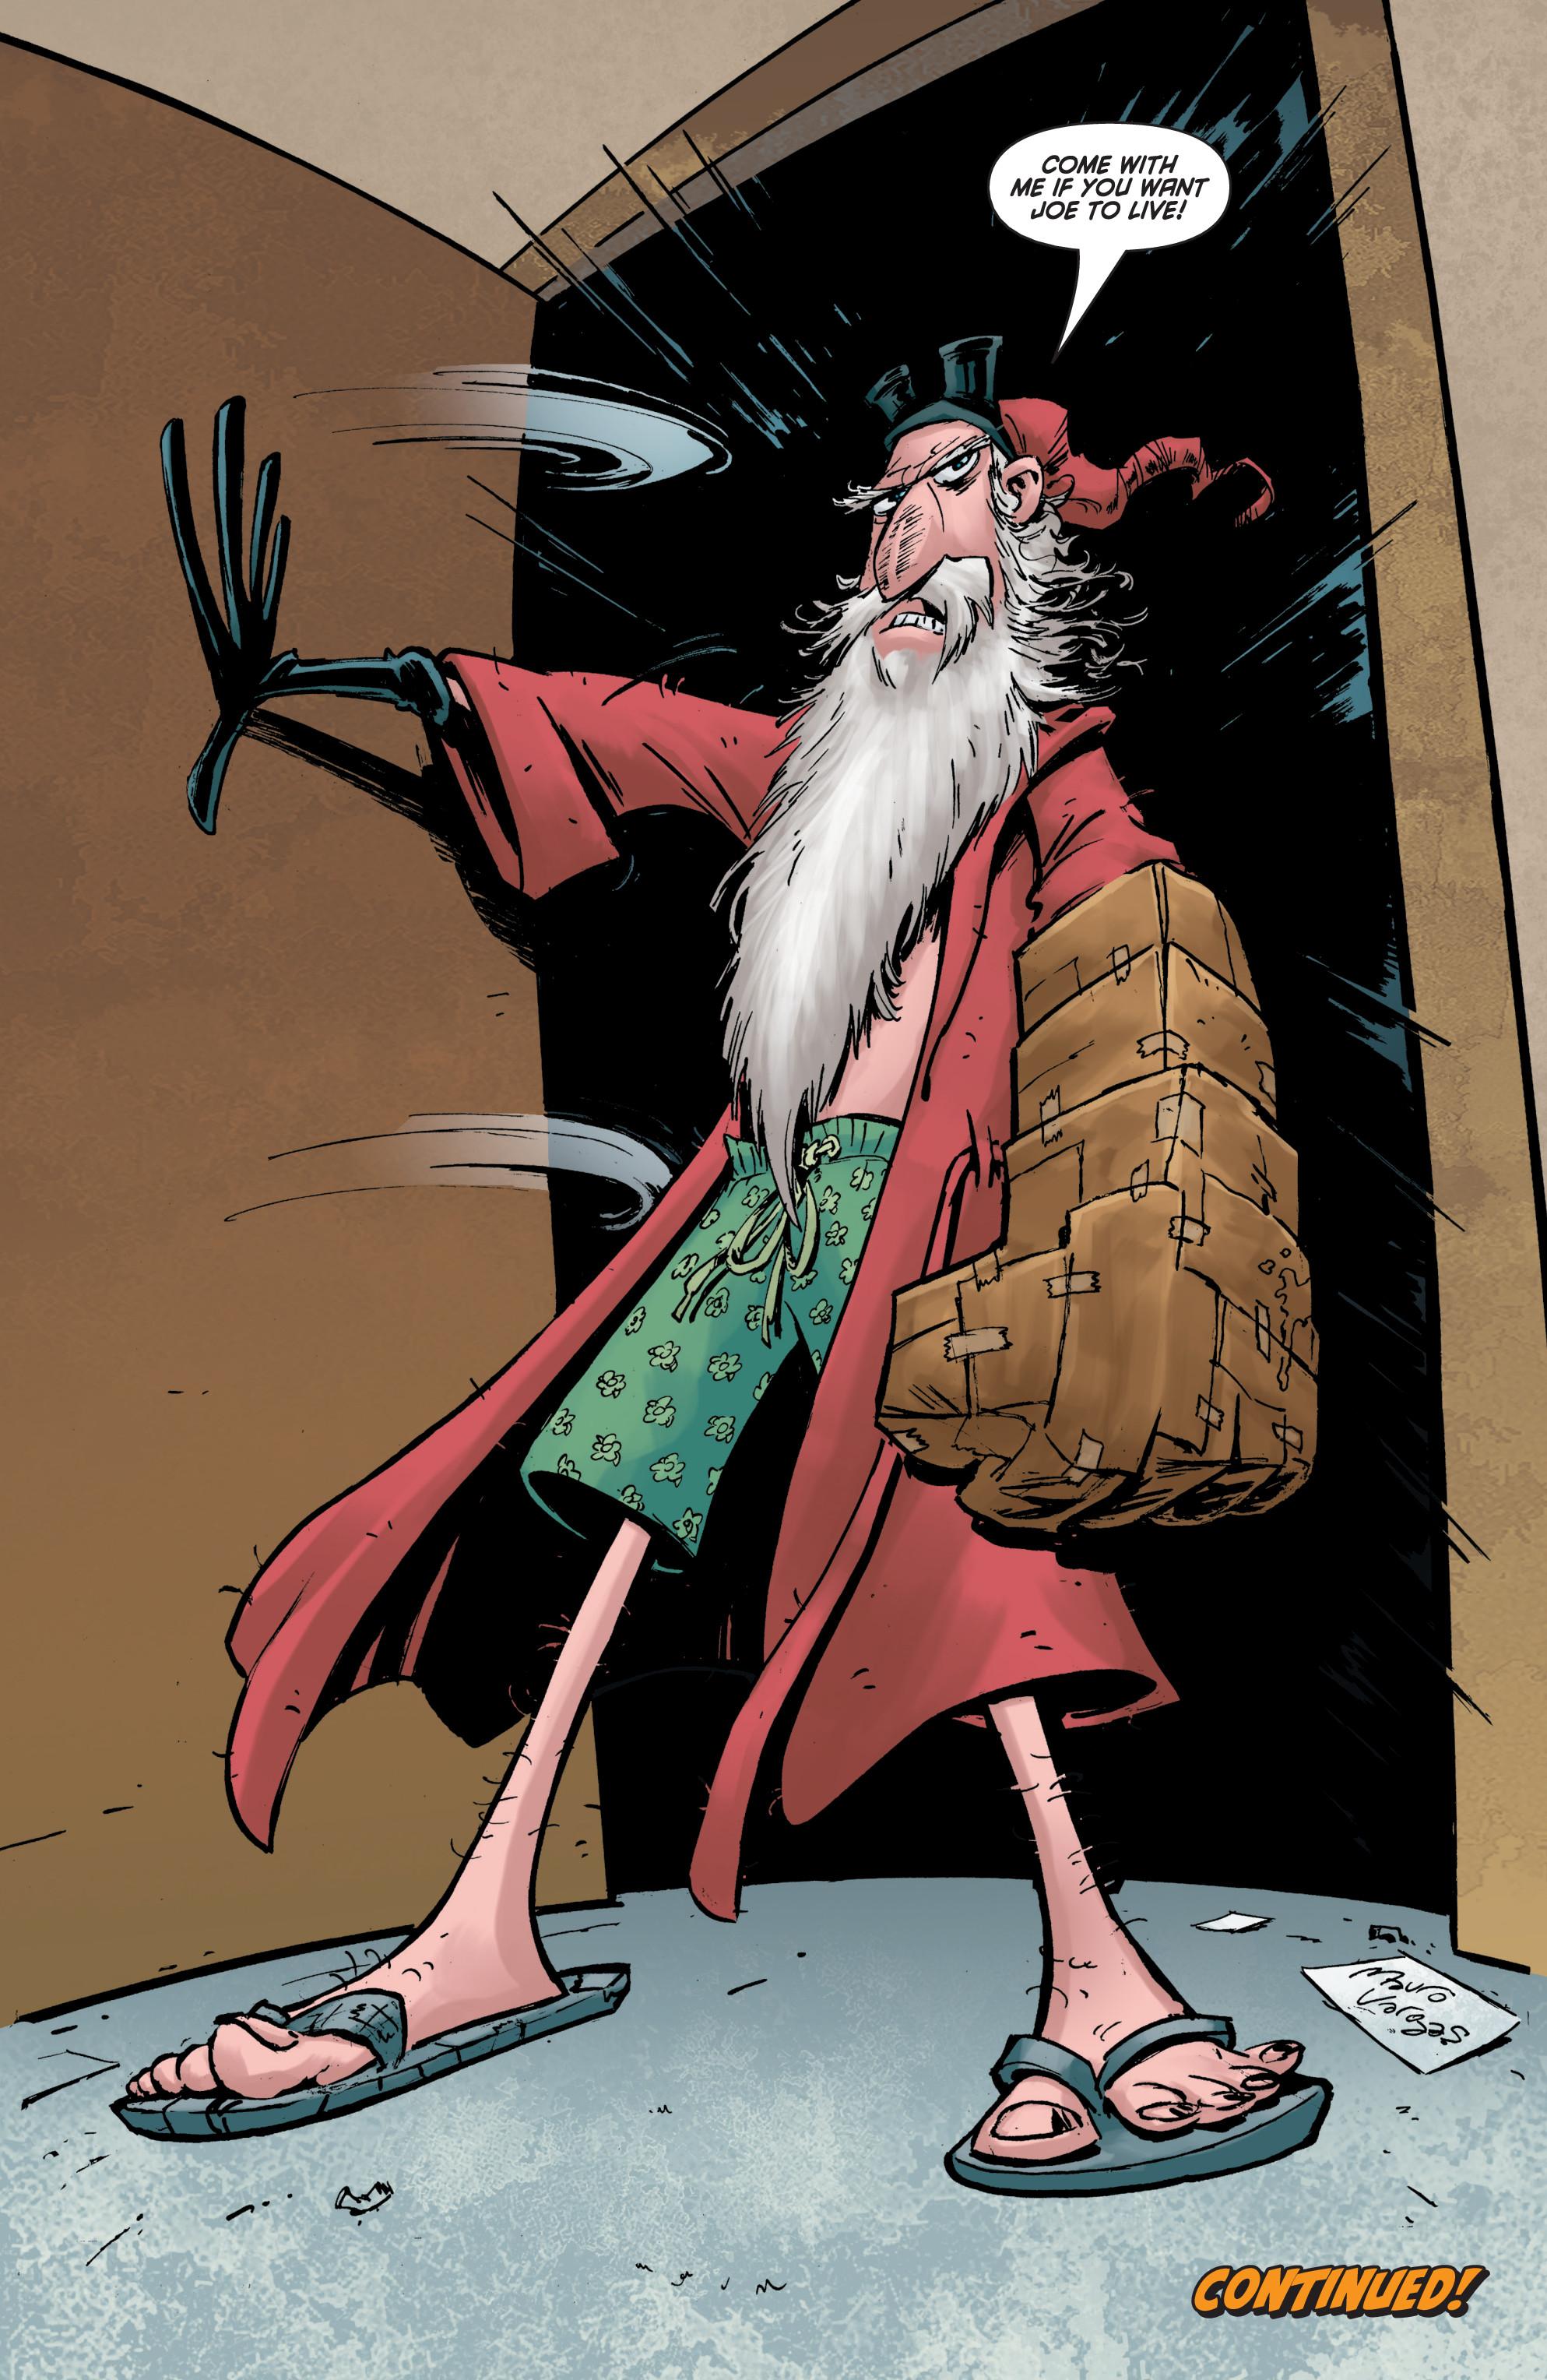 Read online Smosh comic -  Issue #5 - 24